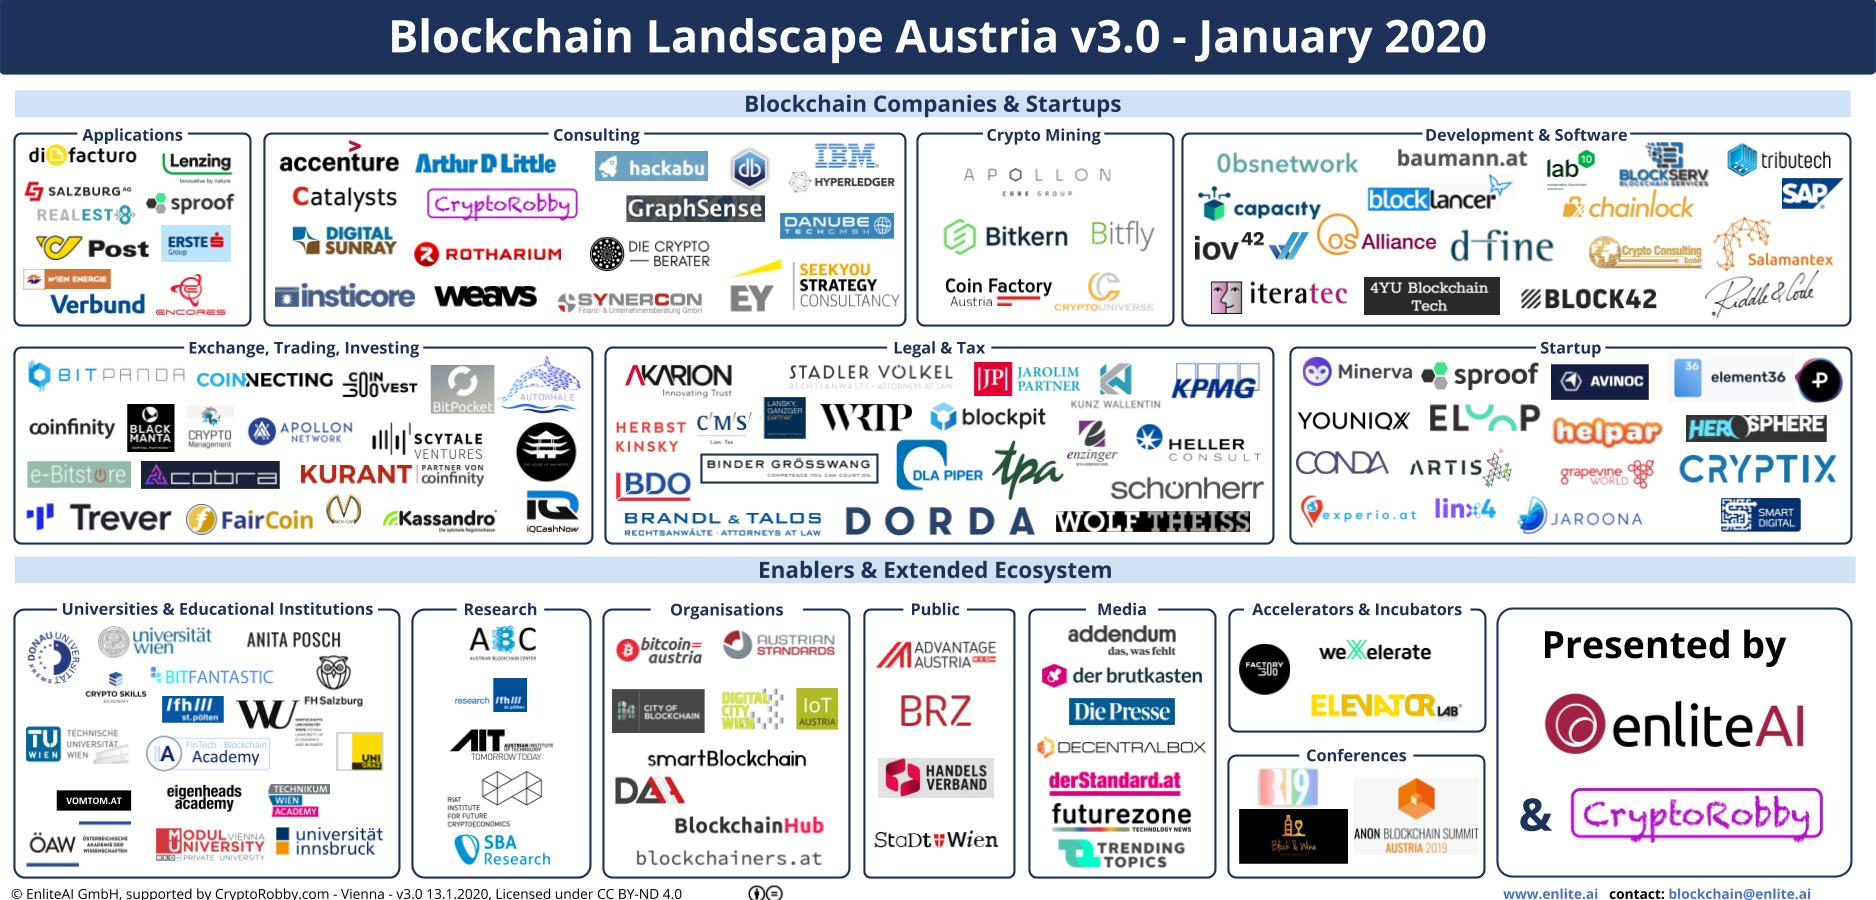 Blockchain Landscape Austria